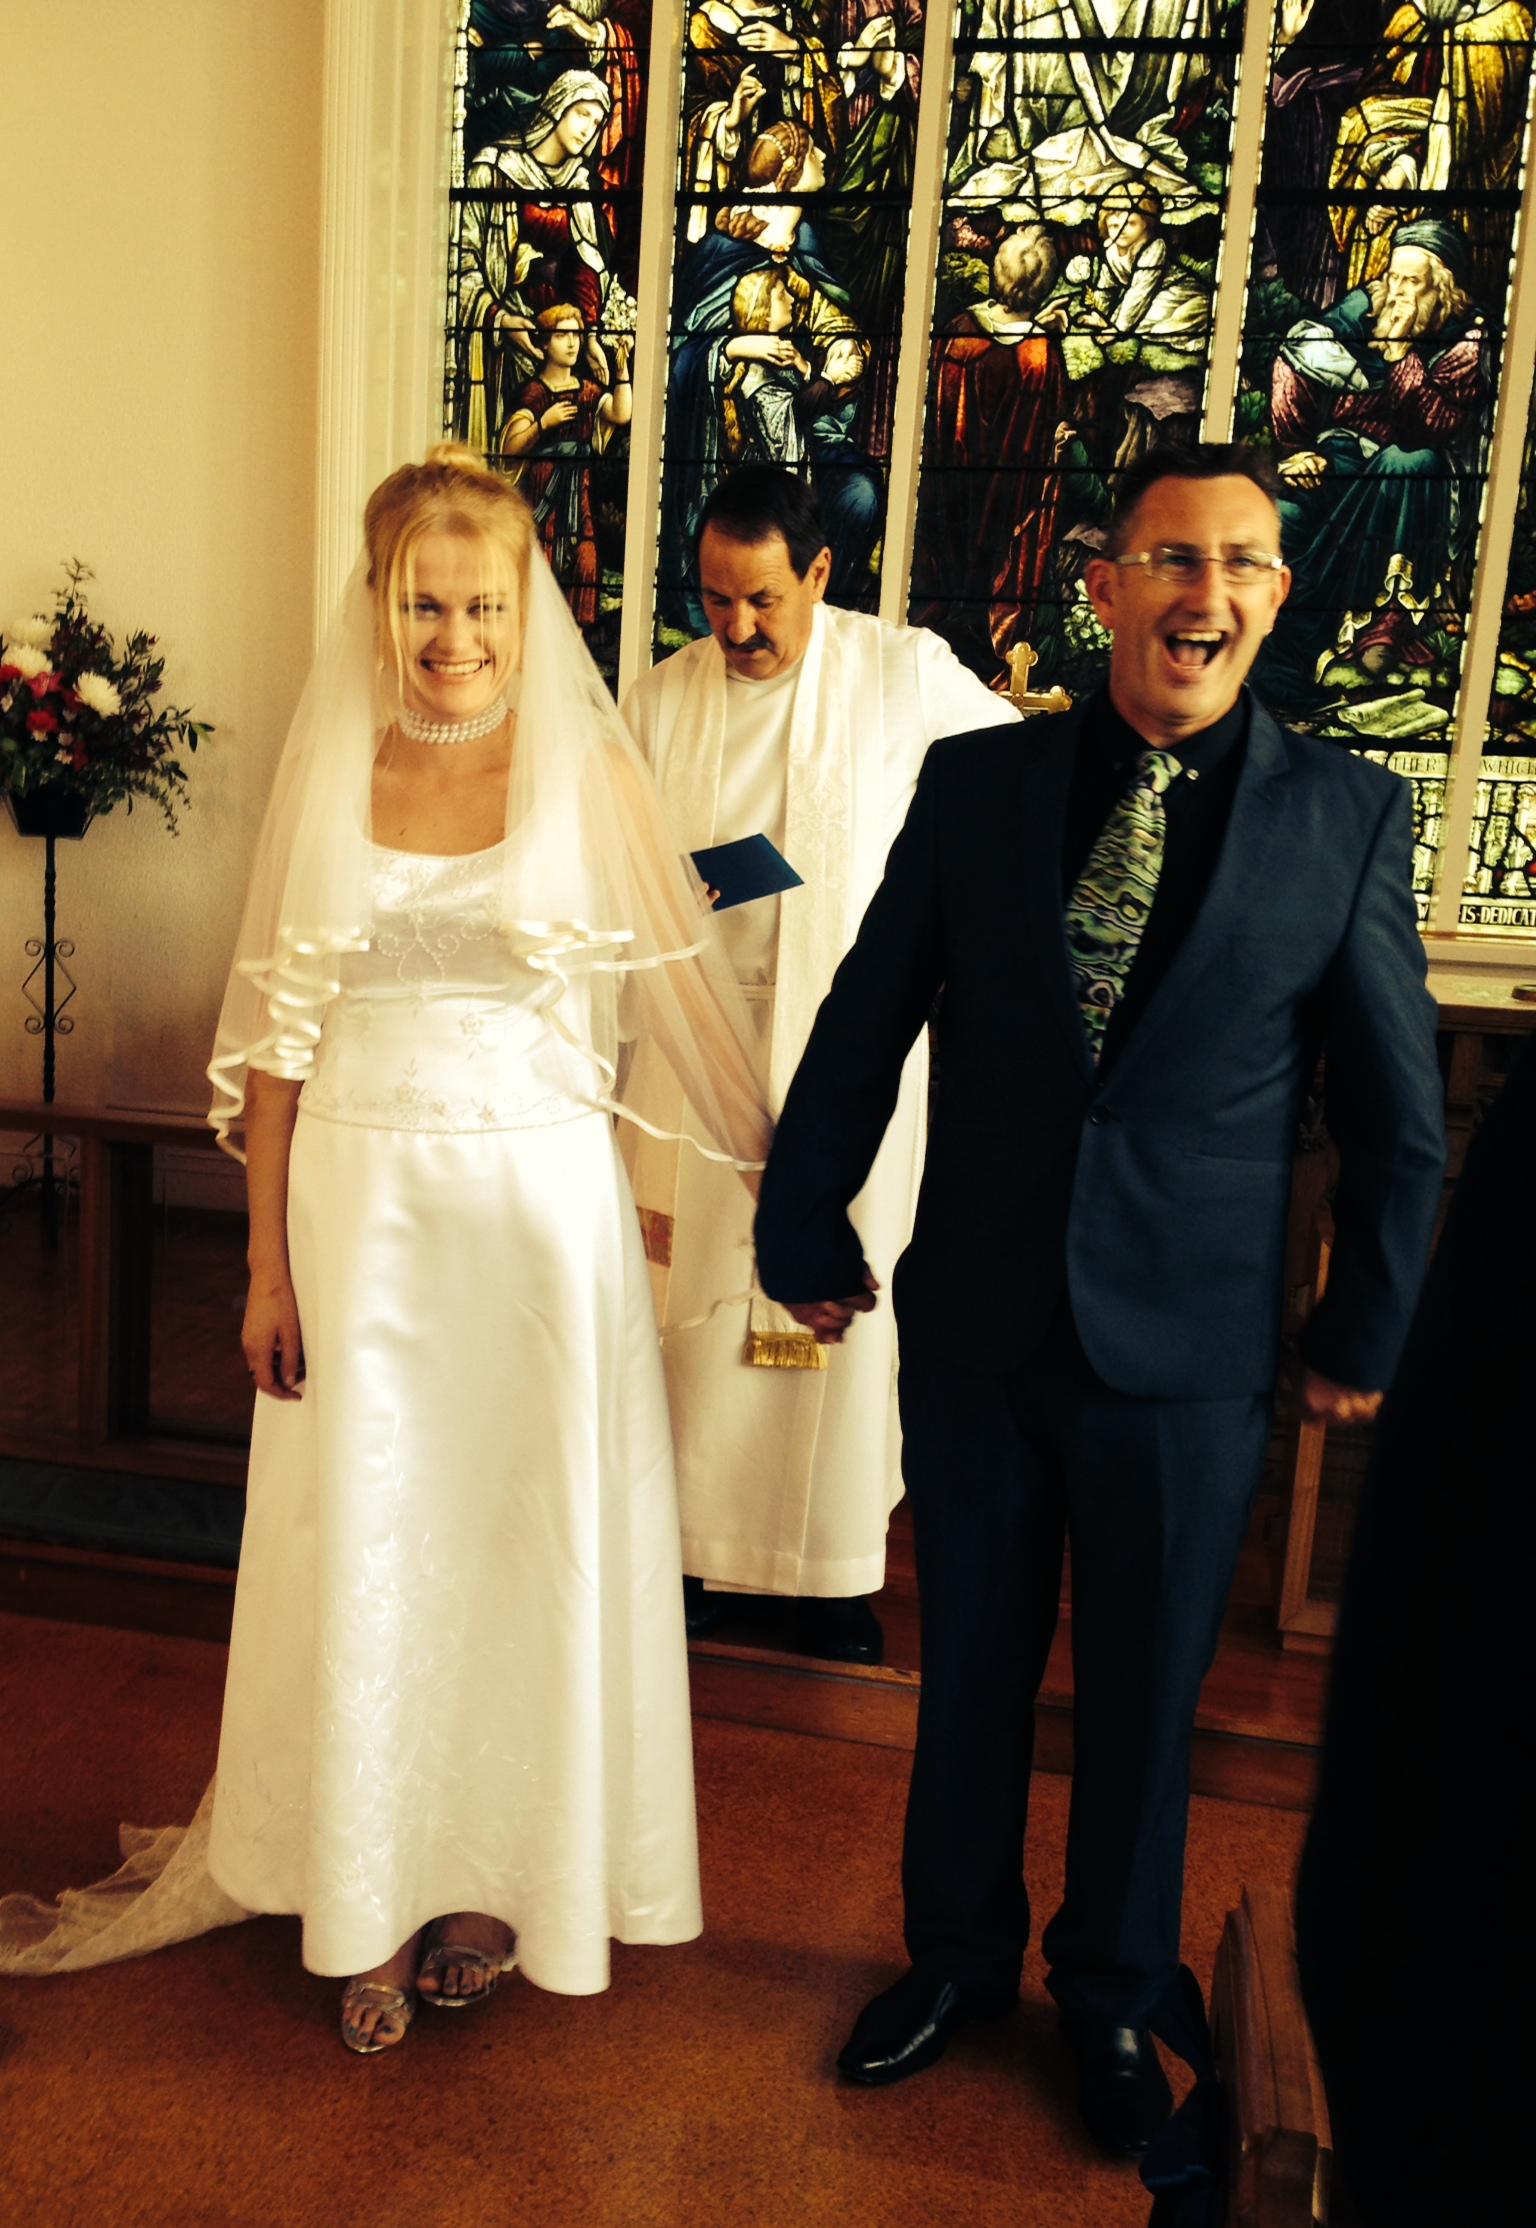 Joanne and Jason Wedding June 2014.jpg